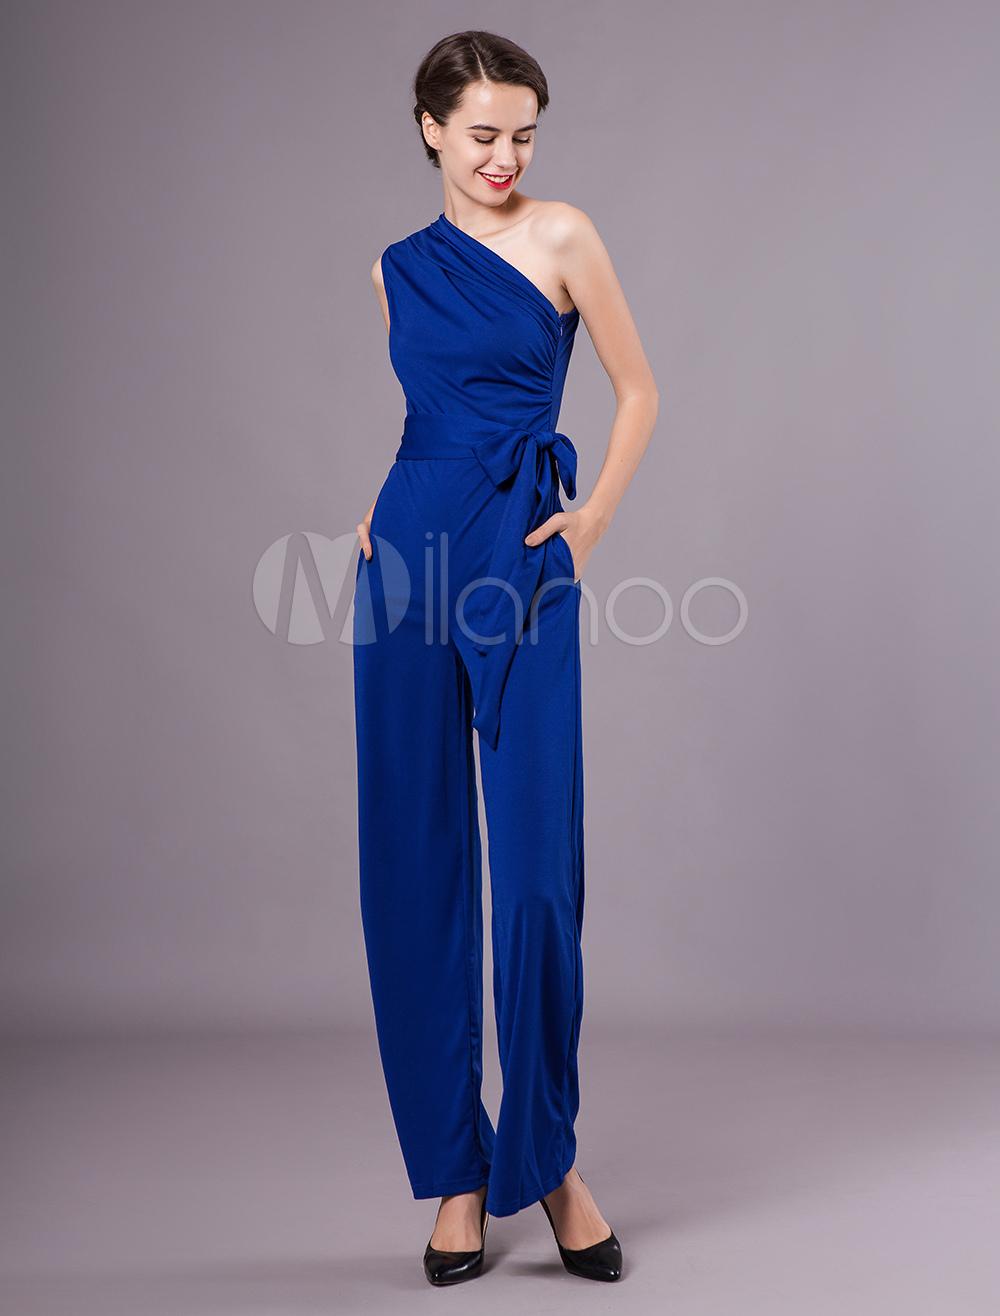 Women Sexy Jumpsuit One Shoulder Sleeveless Blue Sash Summer Jumpsuit